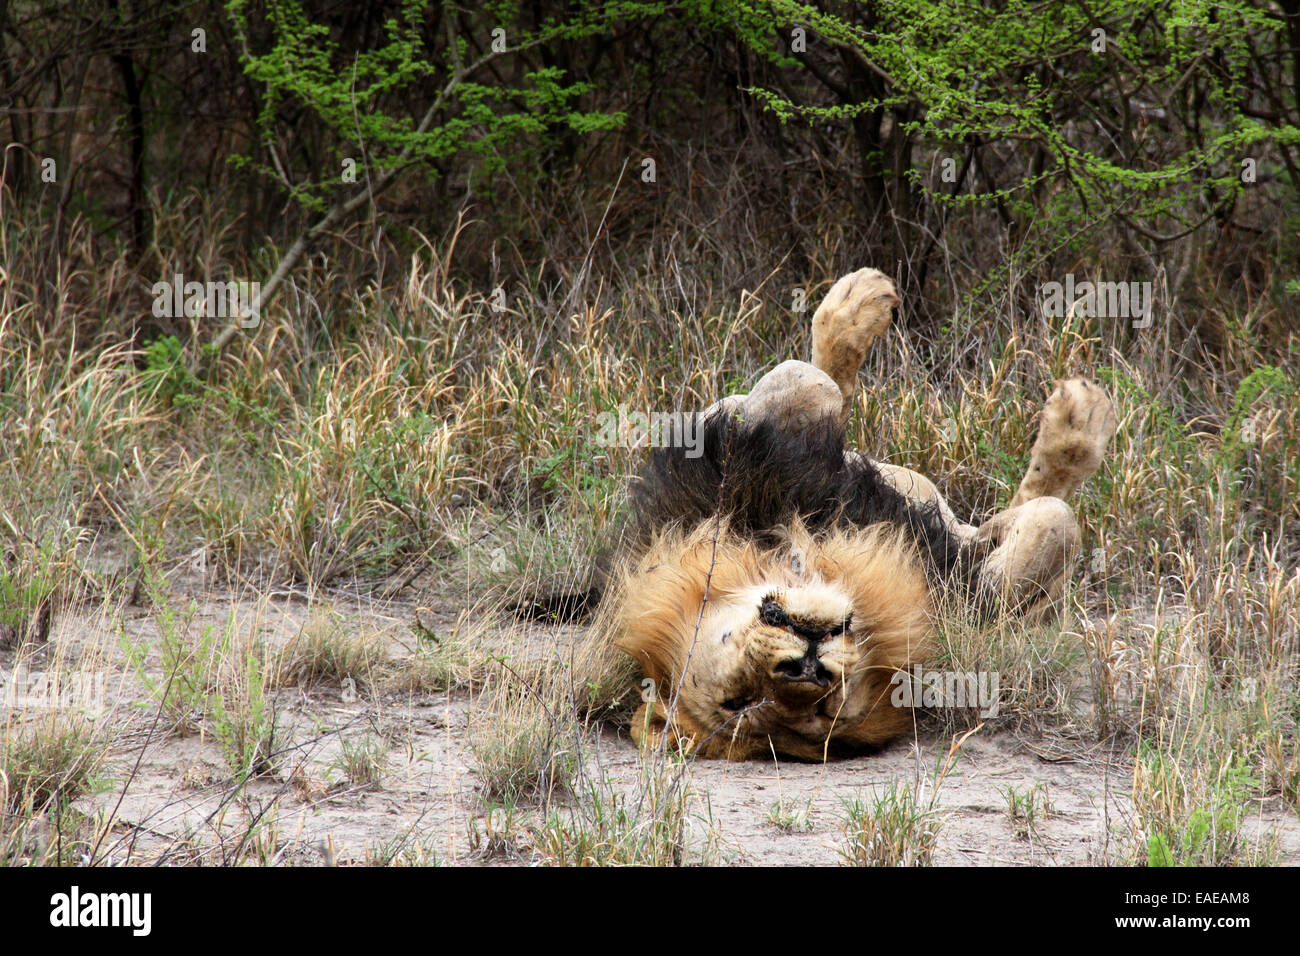 Sleeping Lion, Madikwe, South Africa - Stock Image